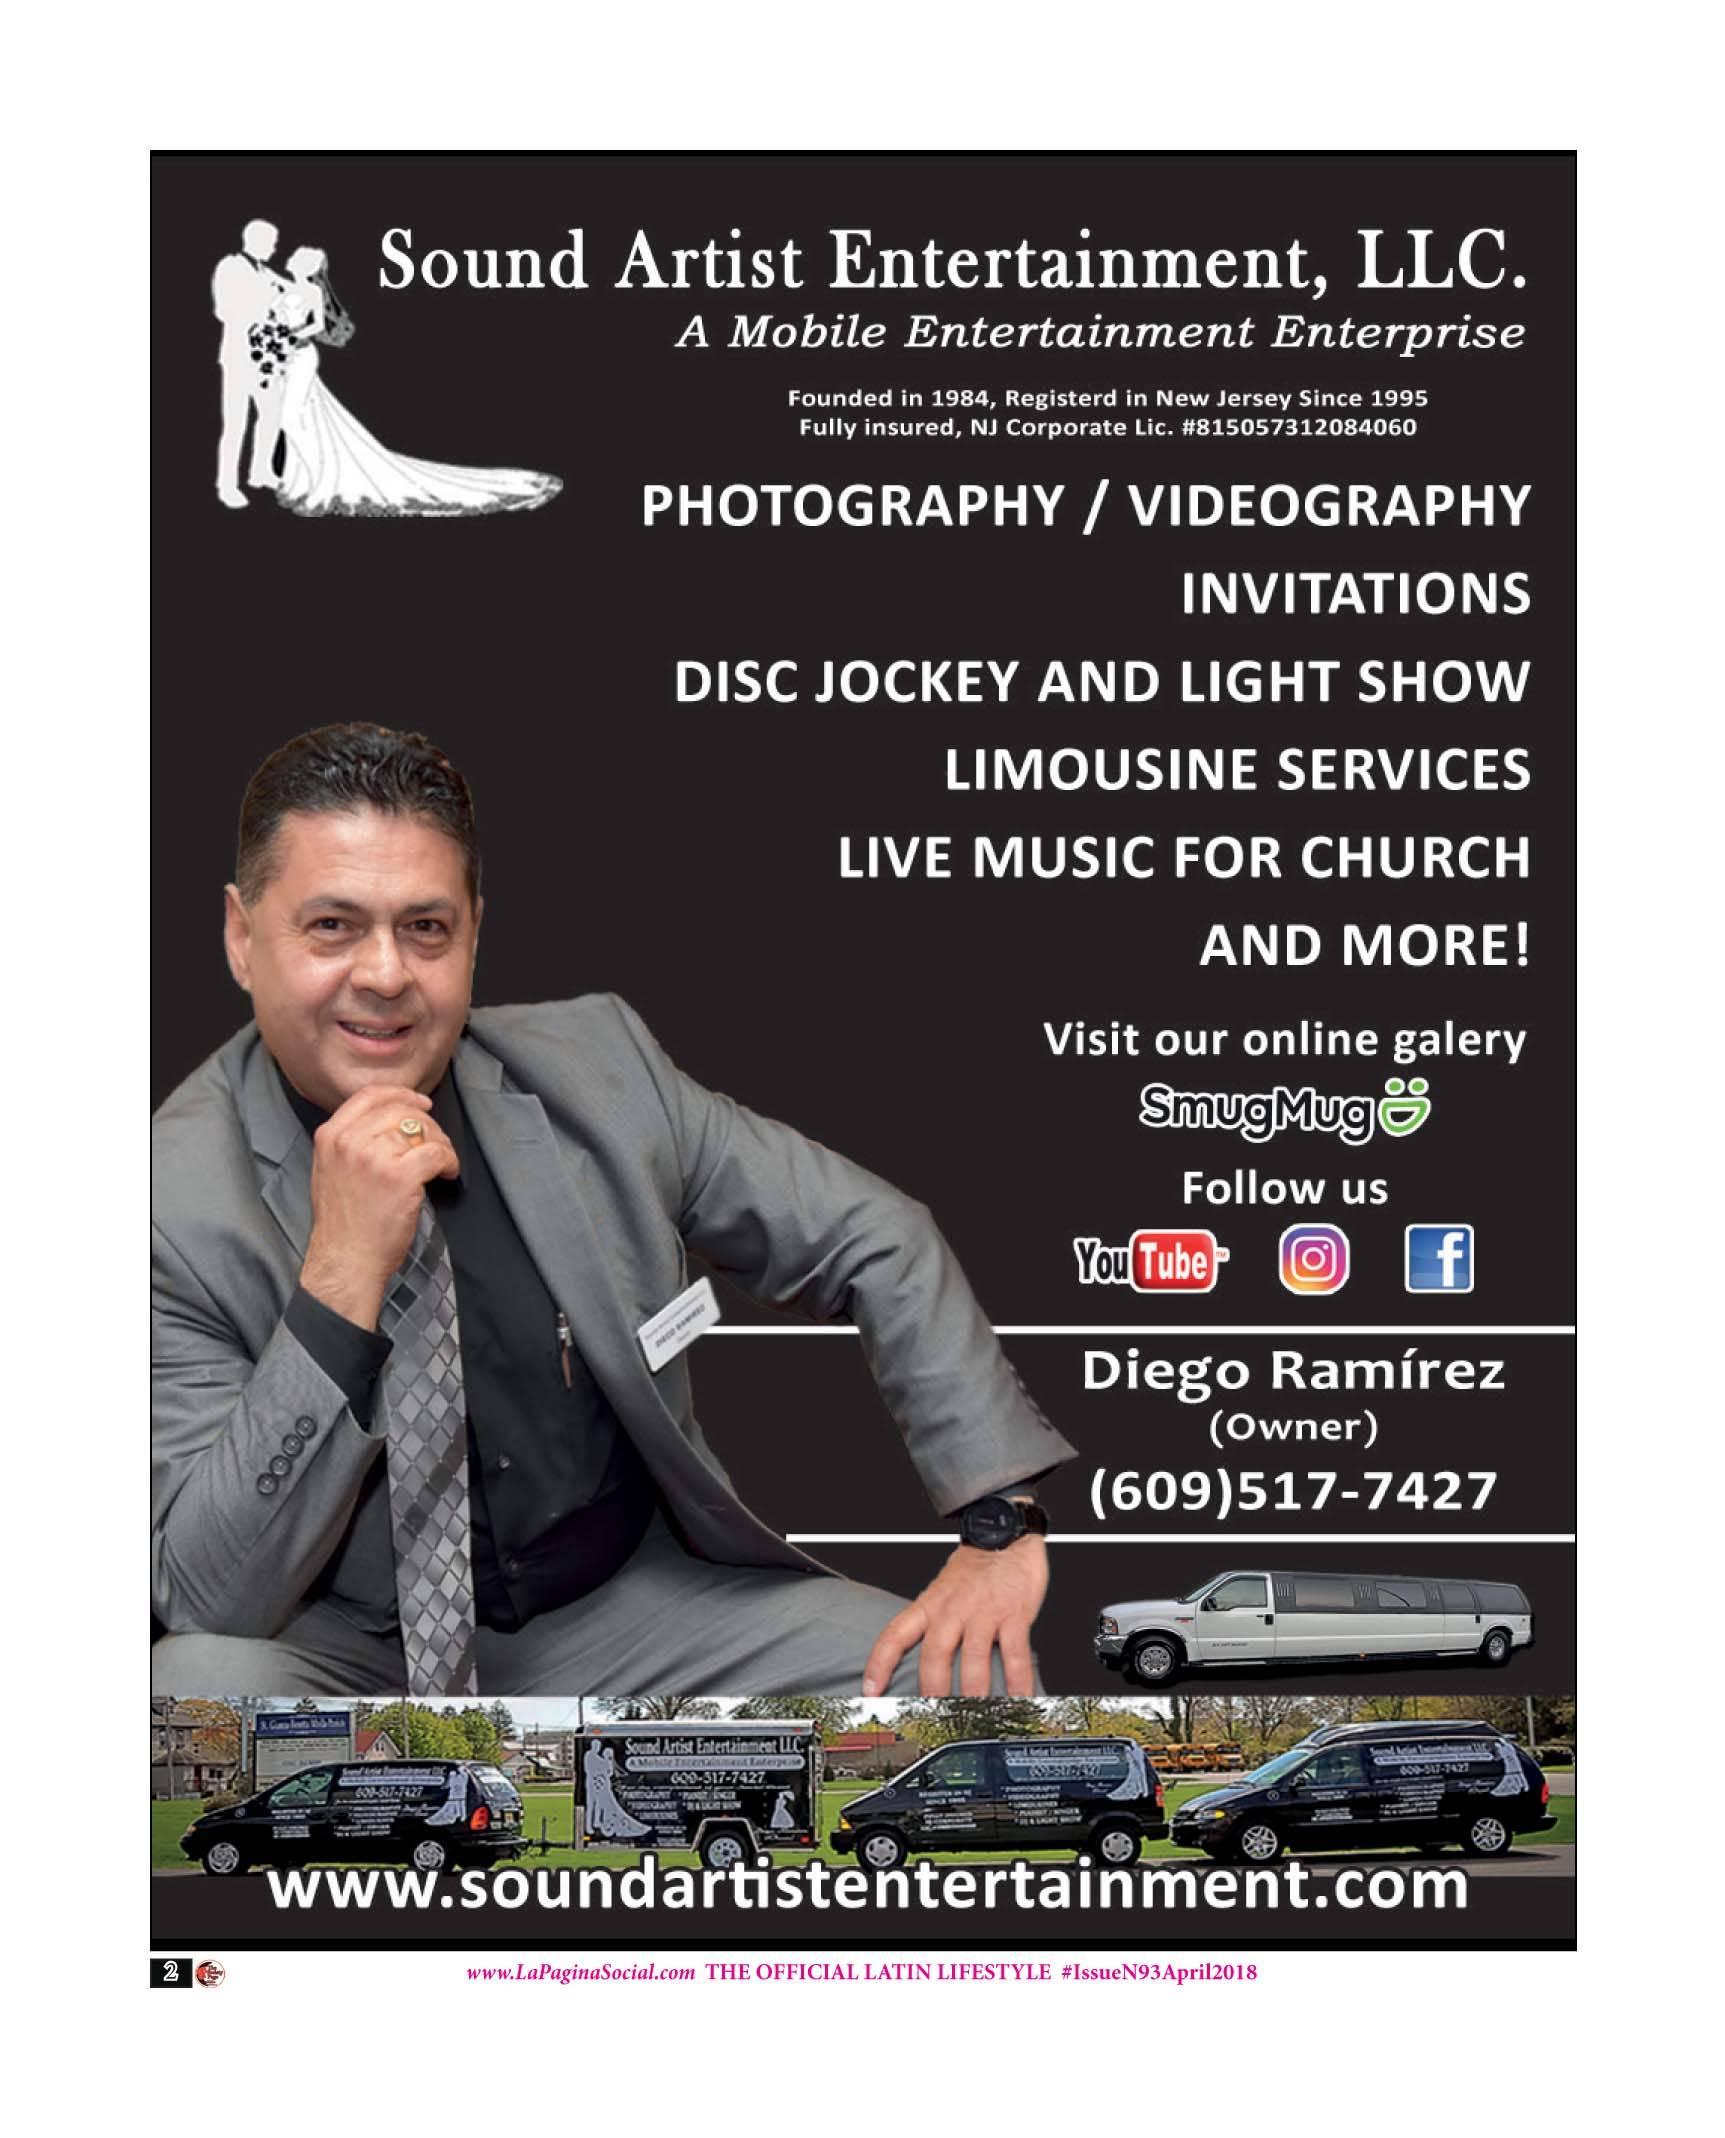 Diego Ramirez, Sound Artist Entertainment